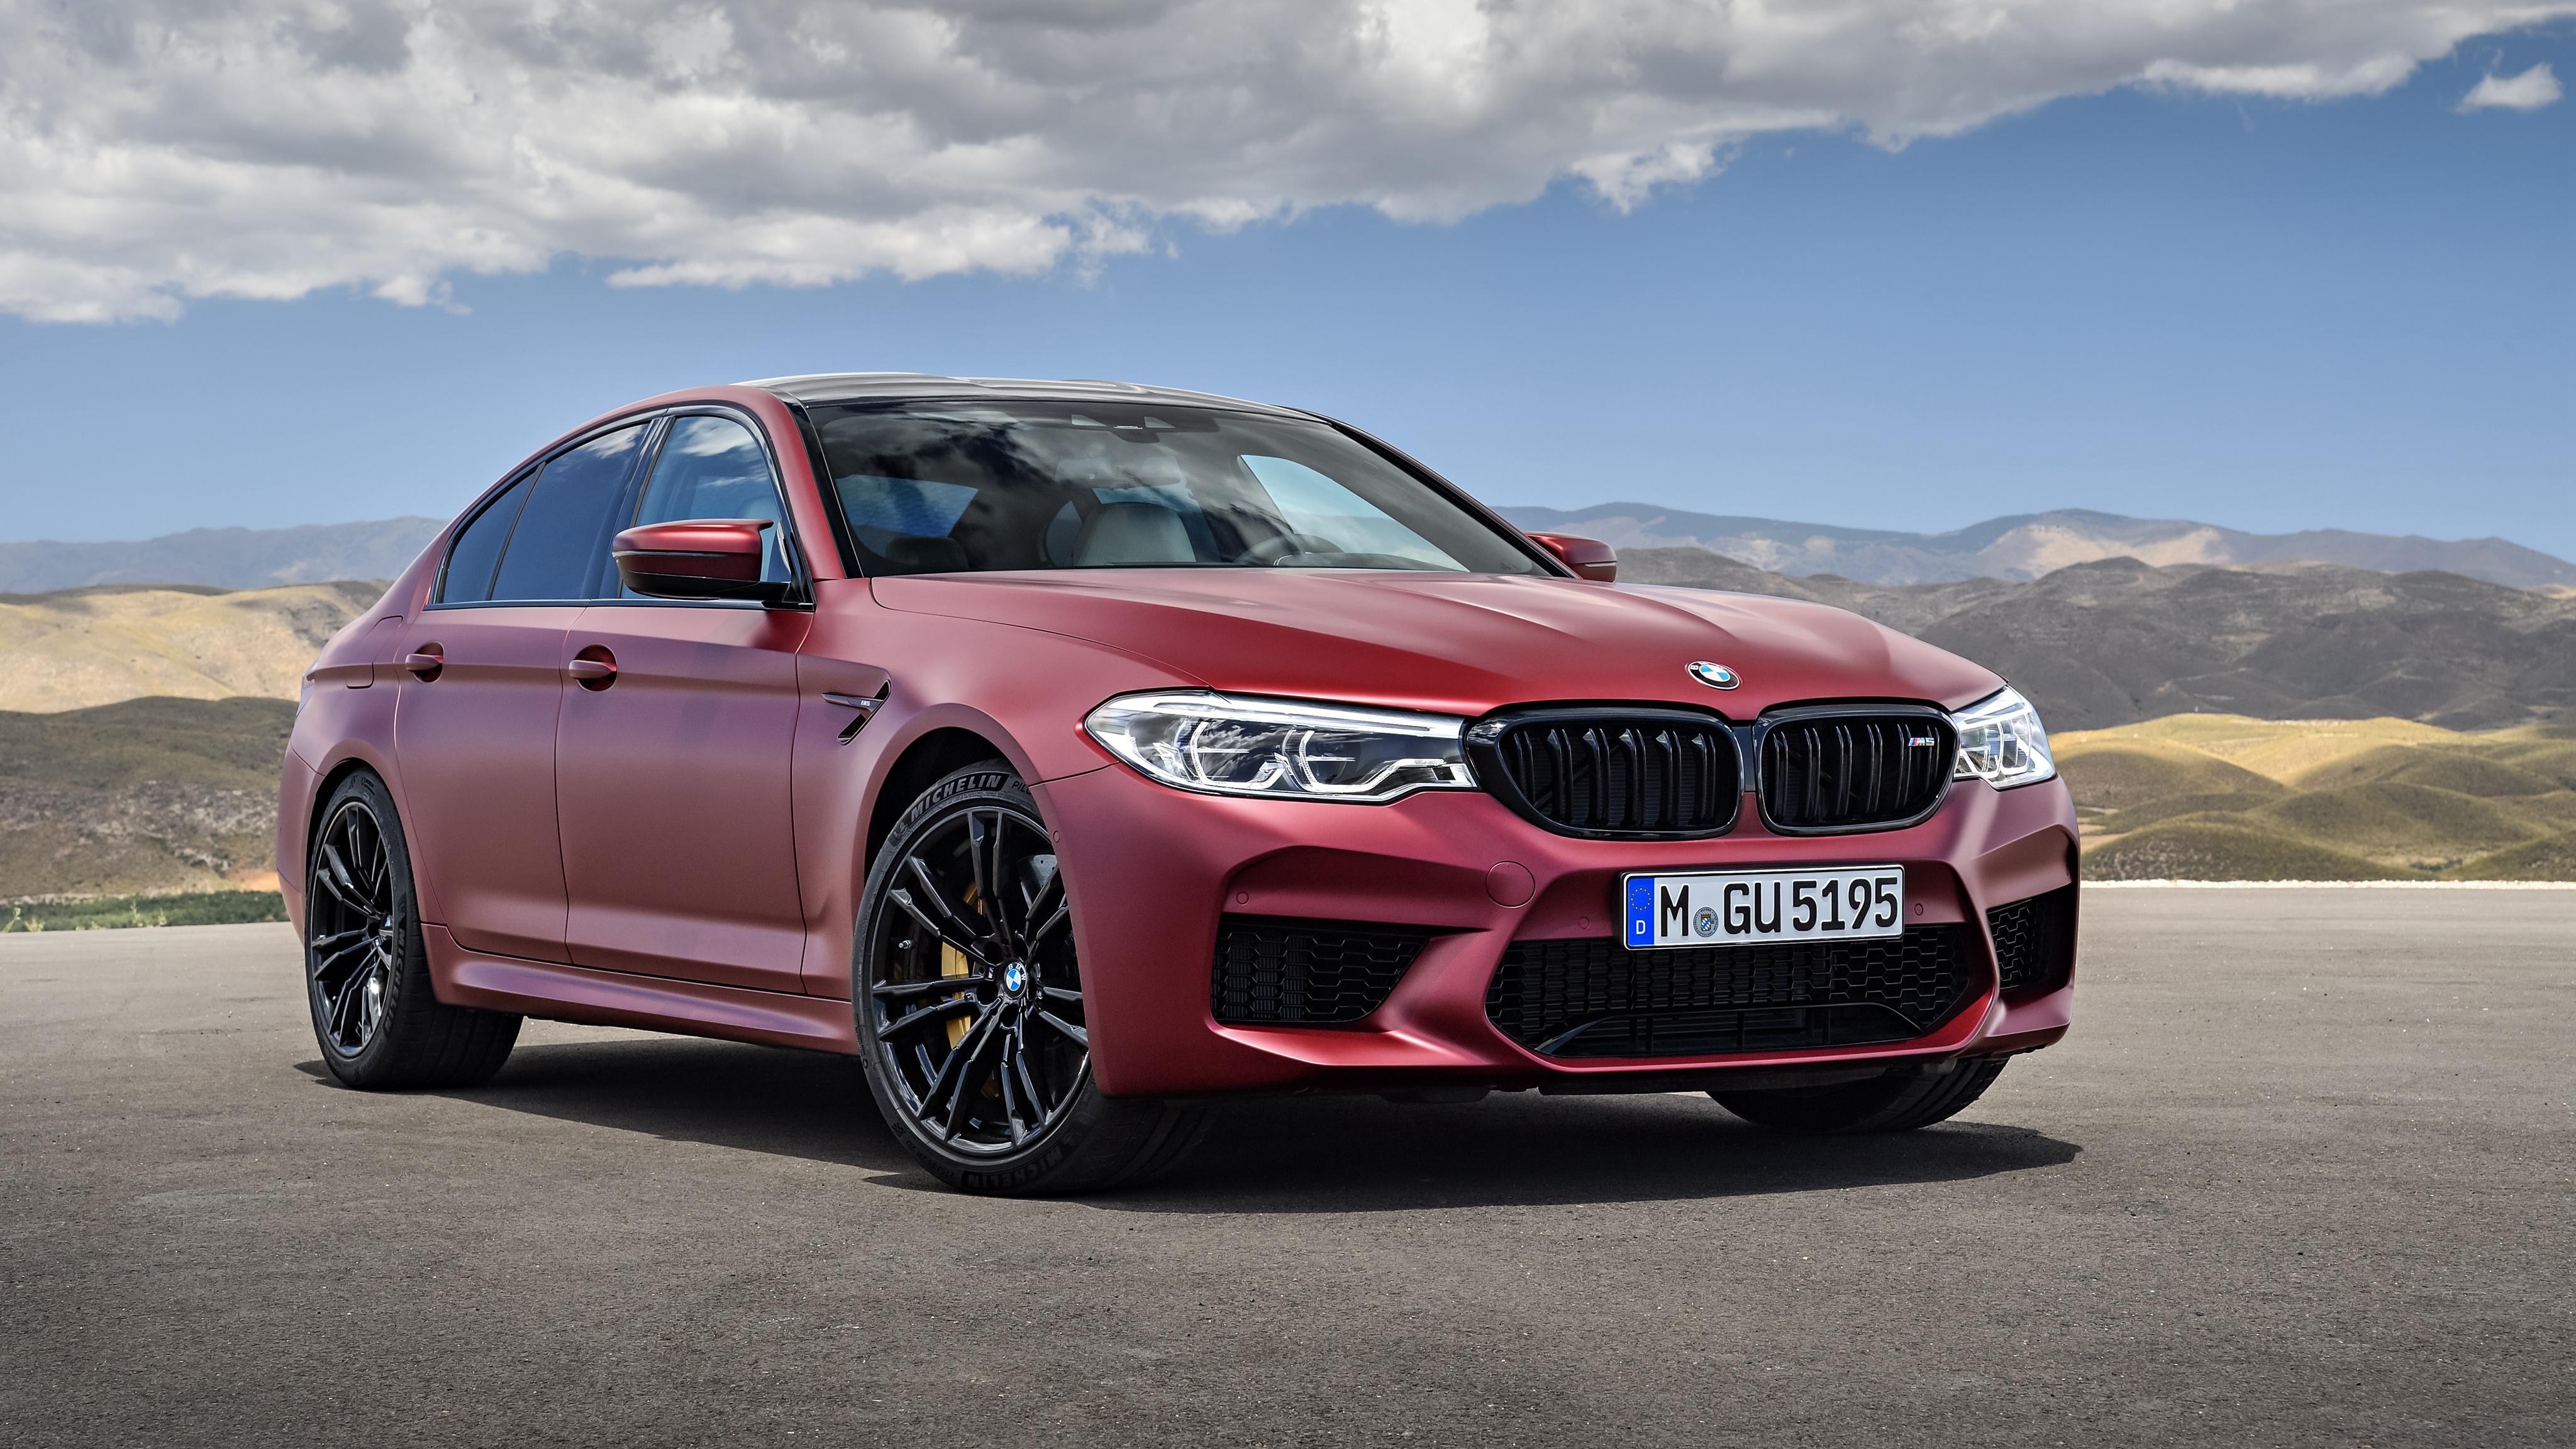 31] BMW M5 2018 Wallpapers on WallpaperSafari 4096x2304